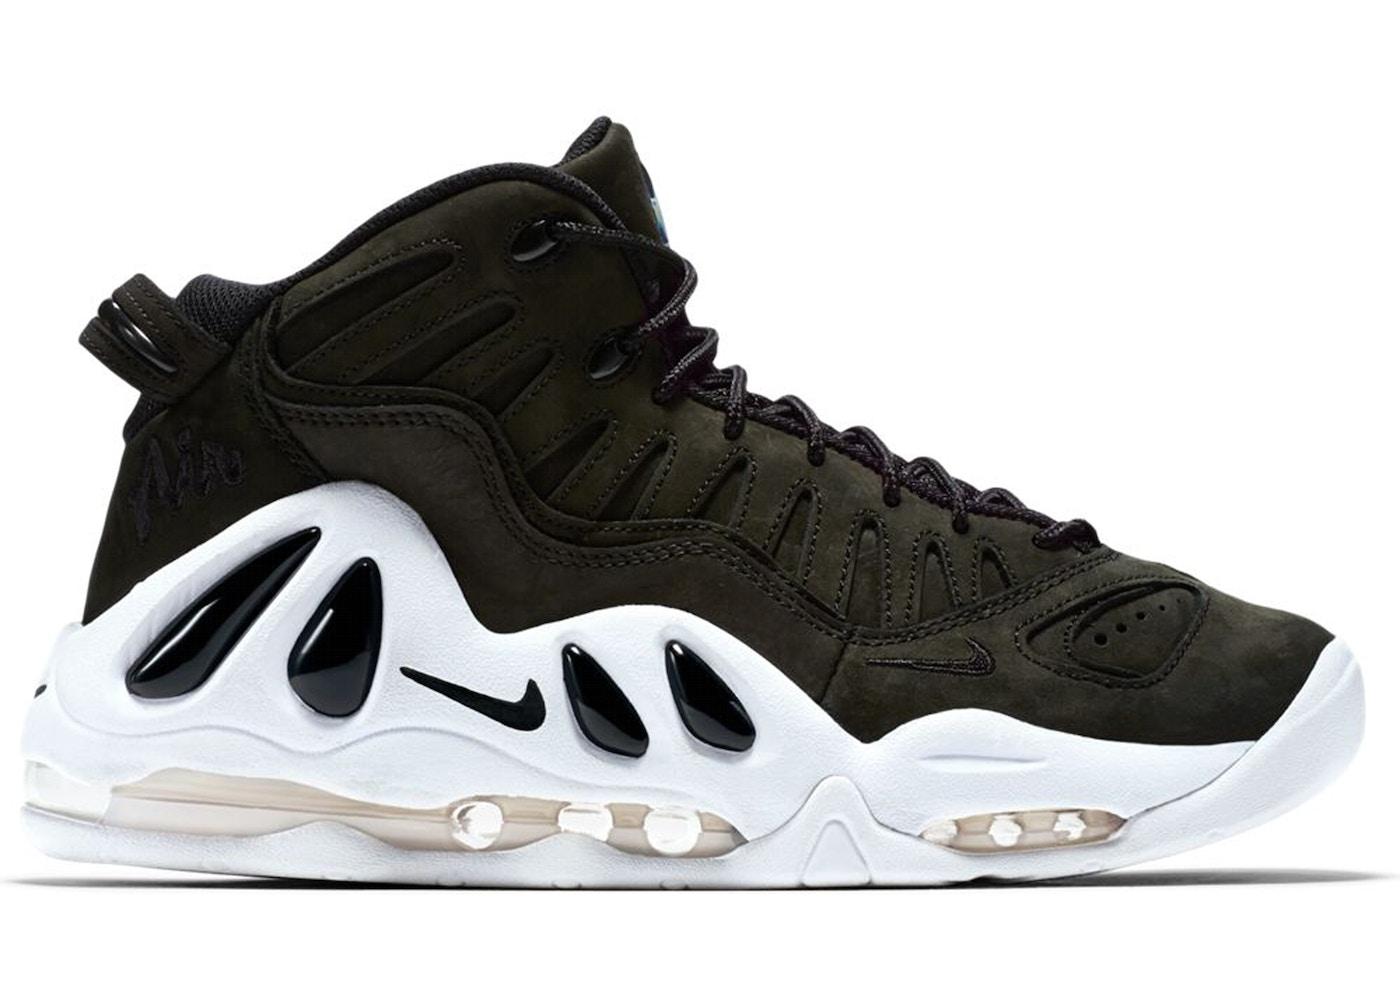 Nike Air Max Uptempo 97 Black White